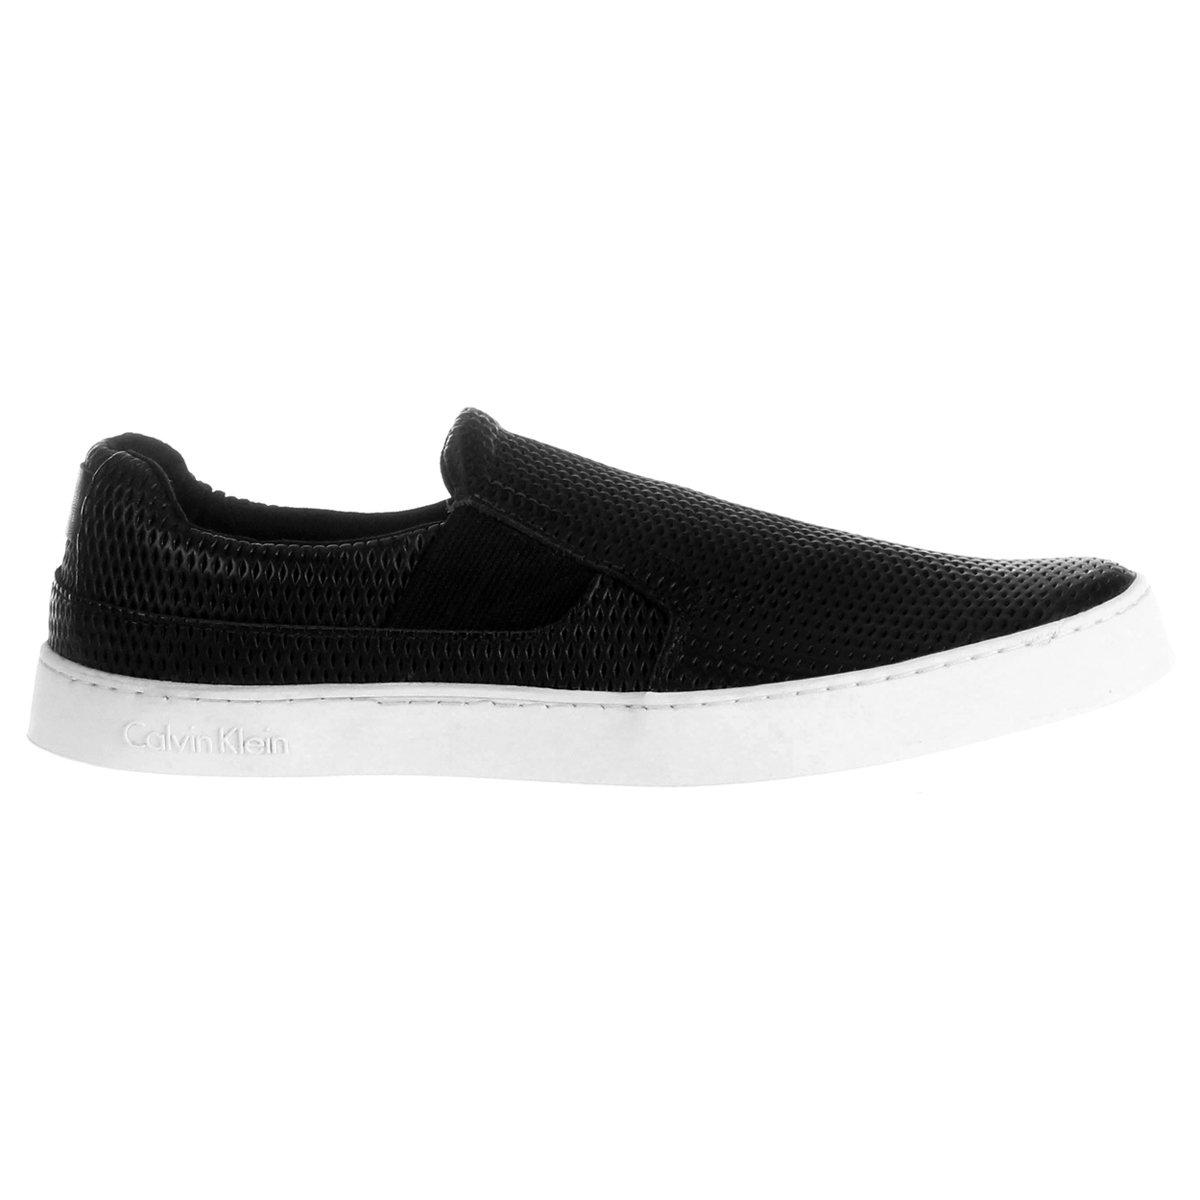 520e82e6f83fa Sapatênis Calvin Klein Iate West Street - Compre Agora   Netshoes